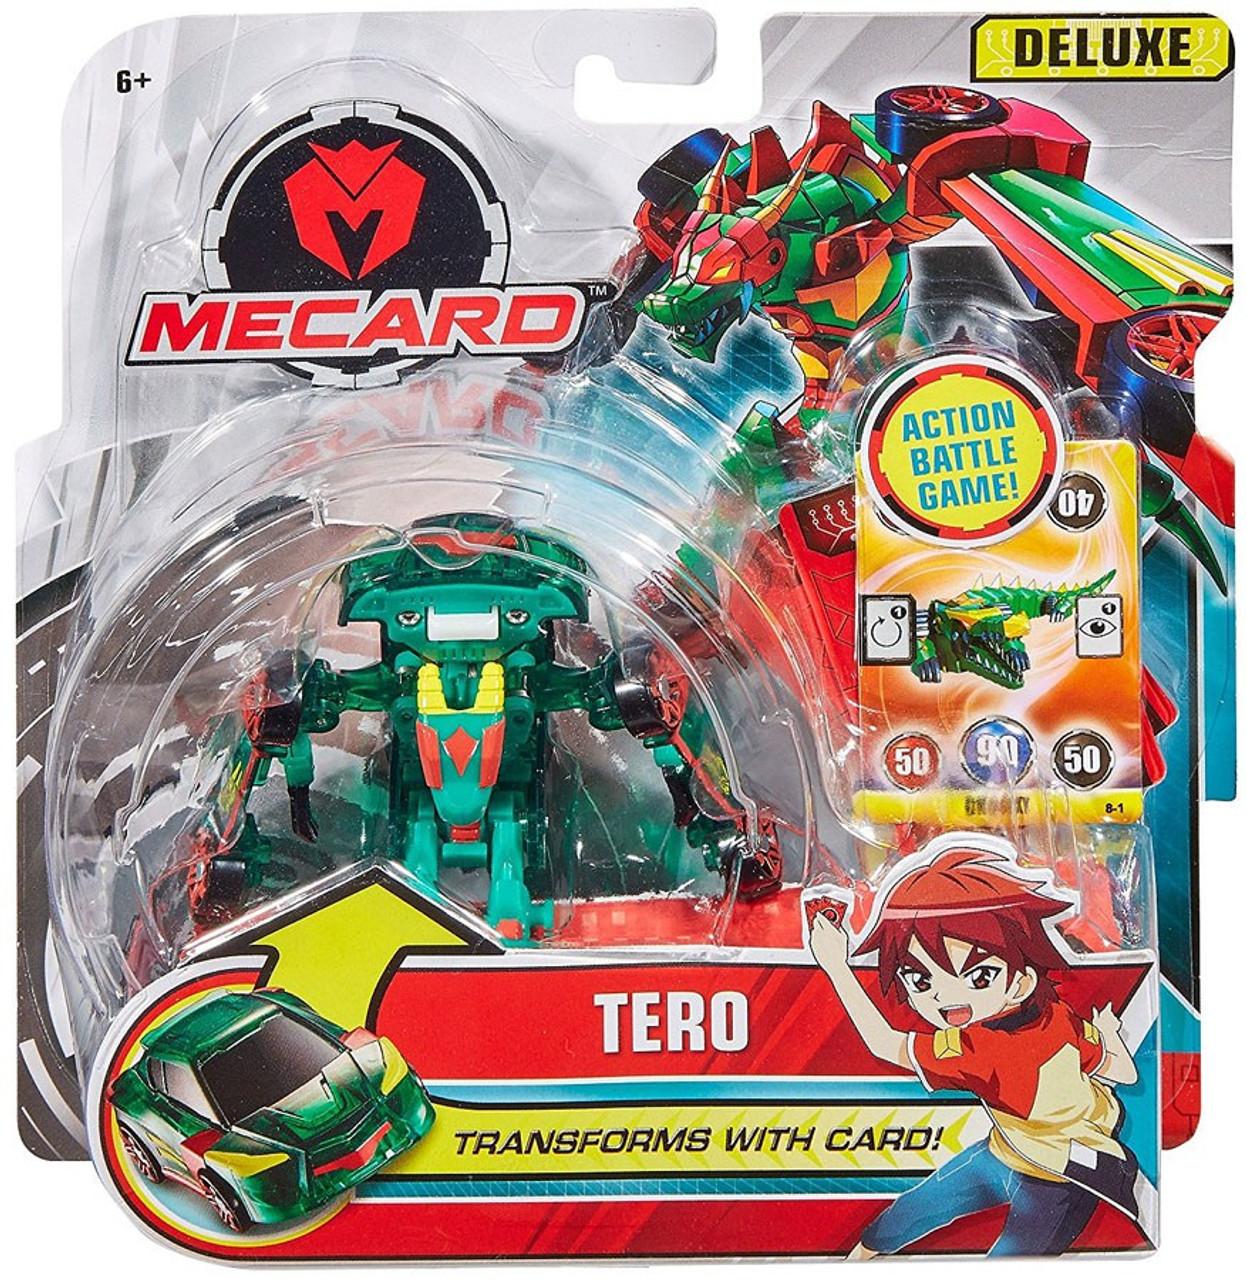 56250f63f64 MeCard Deluxe Mecardimal Tero Figure Mattel - ToyWiz